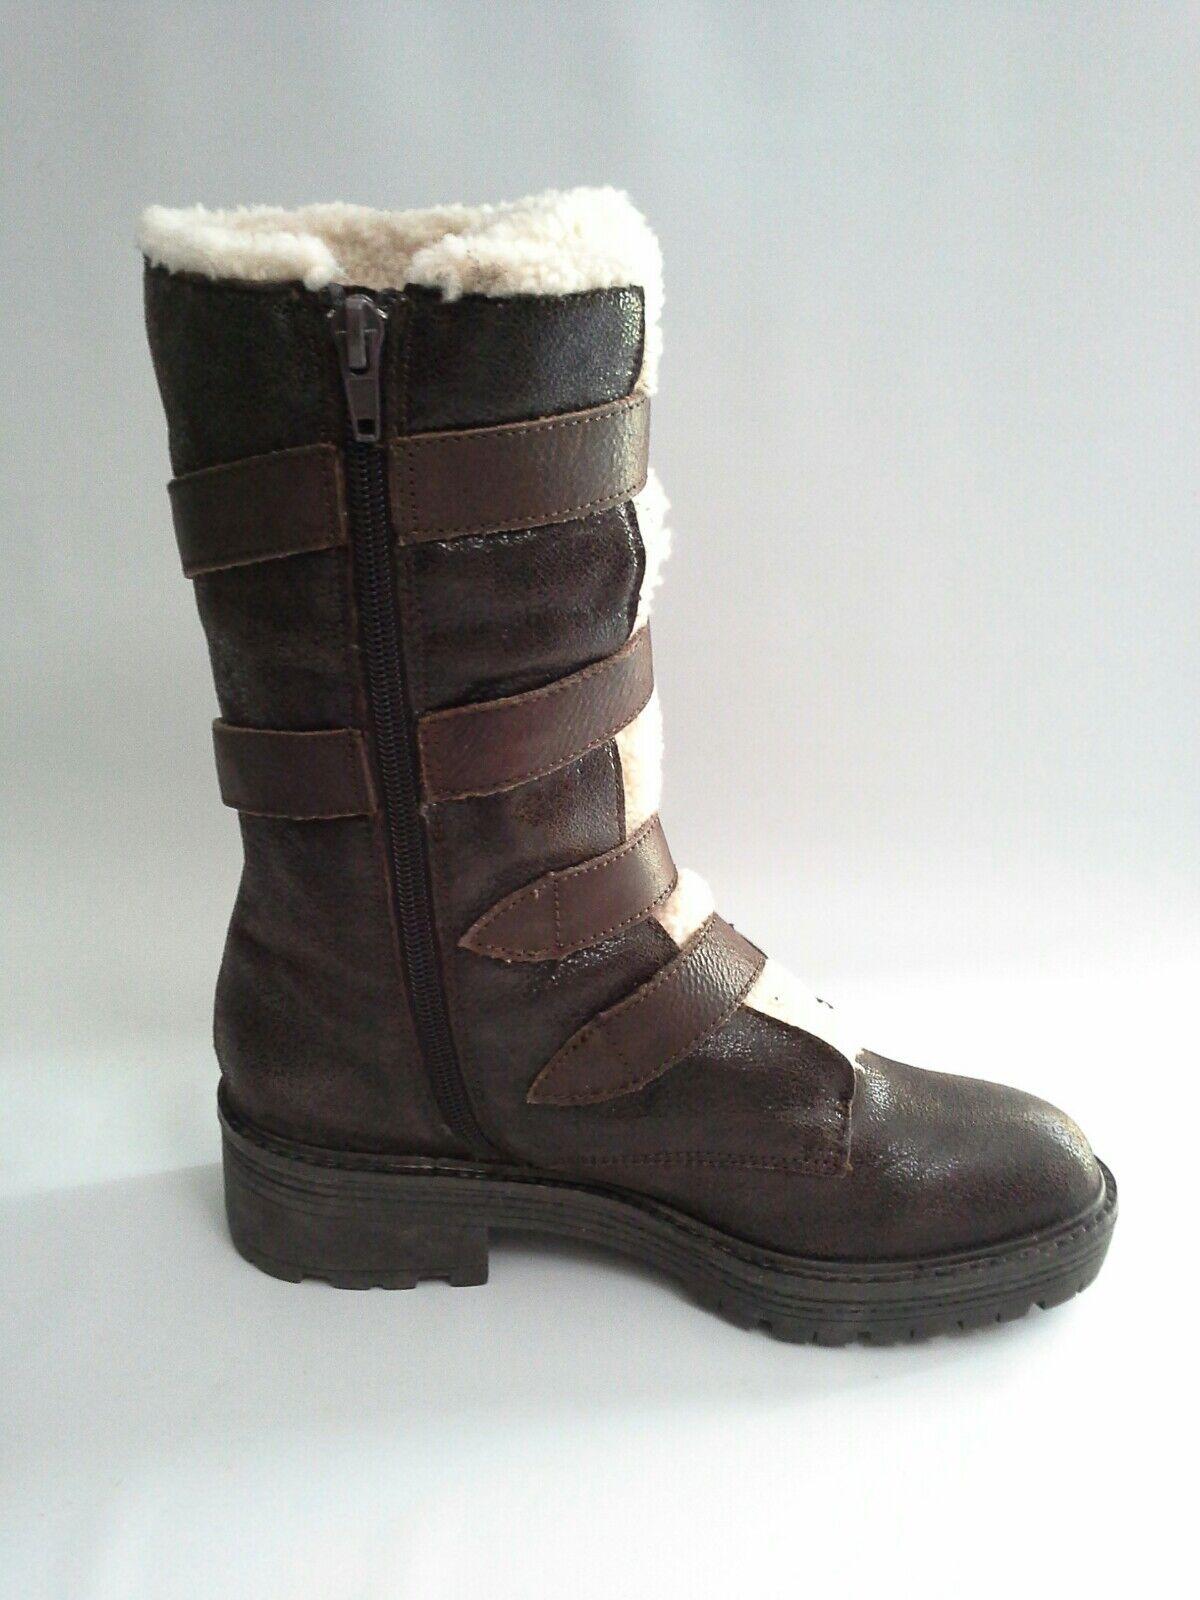 Anthropologie Leather Faux Fur Buckle Boot by Kelsi Dagger Dagger Dagger Brooklyn  Sz 6 774aad